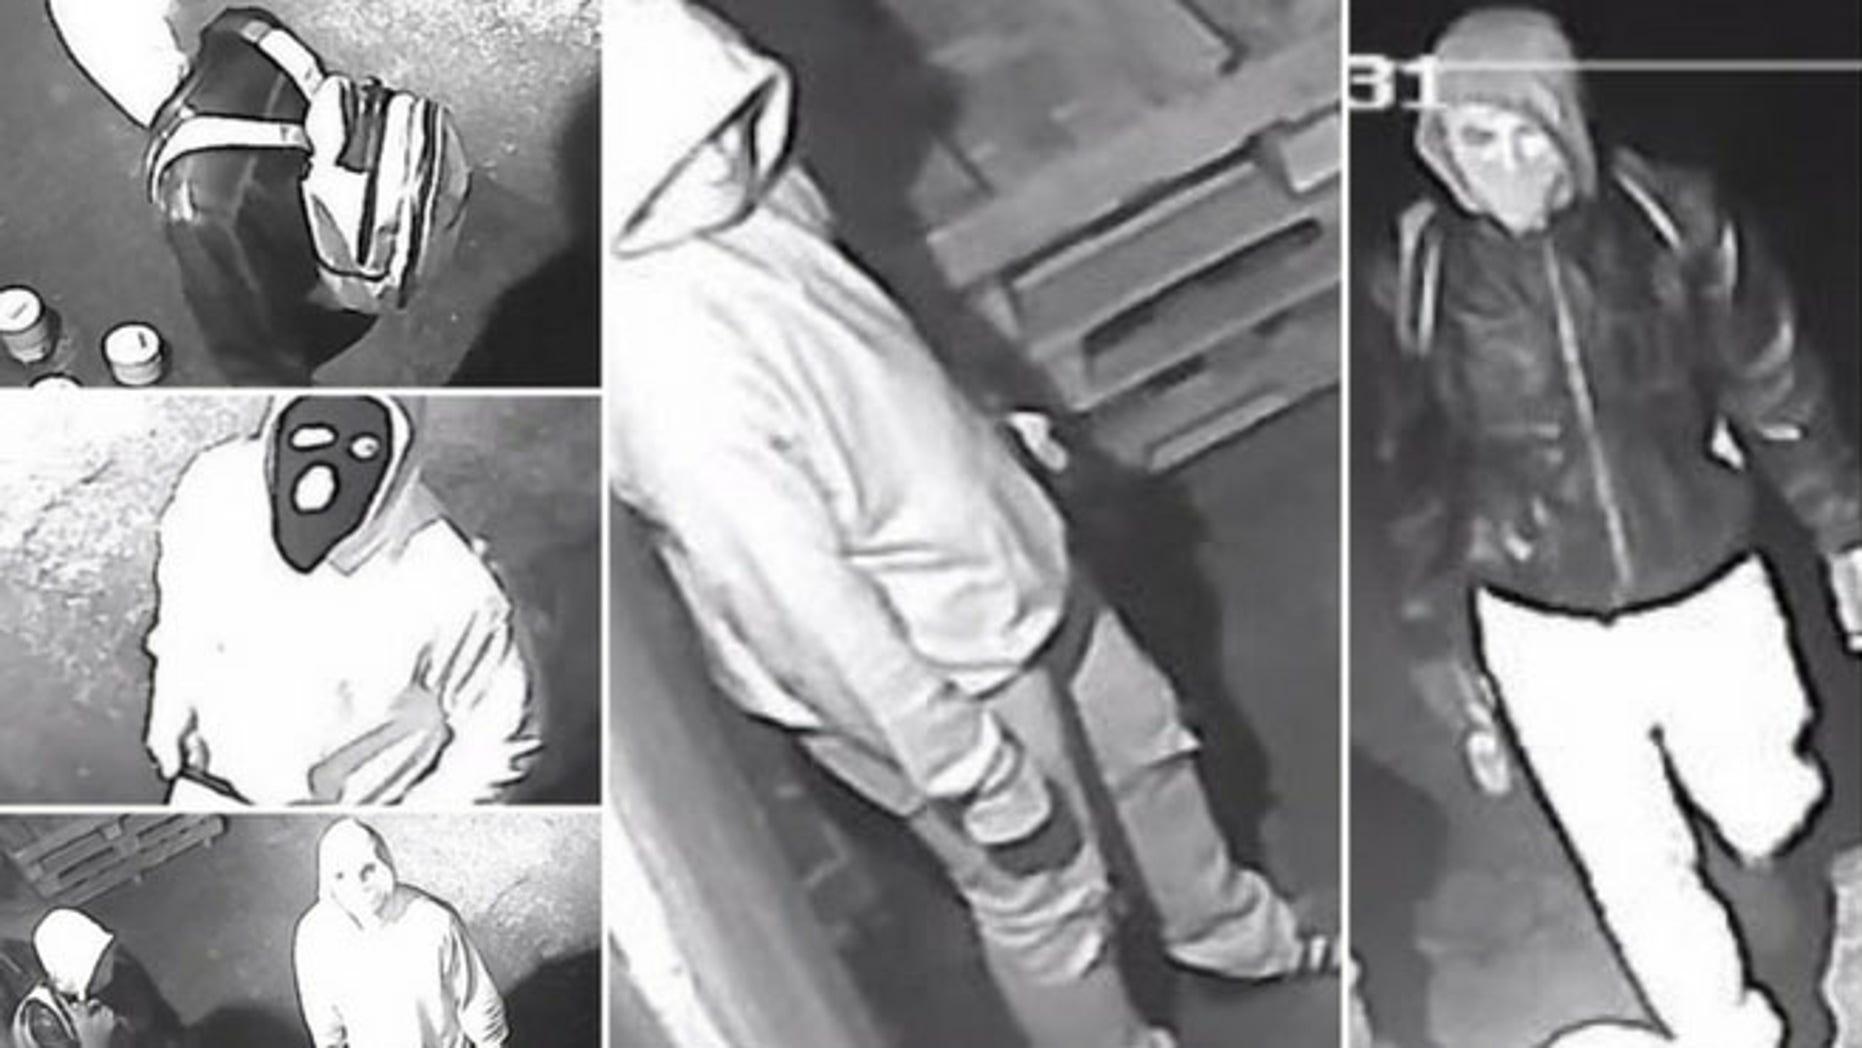 Surveillance footage caught three individuals trying to burglarize a Whitehall, Pa., gun shop on Feb. 23.